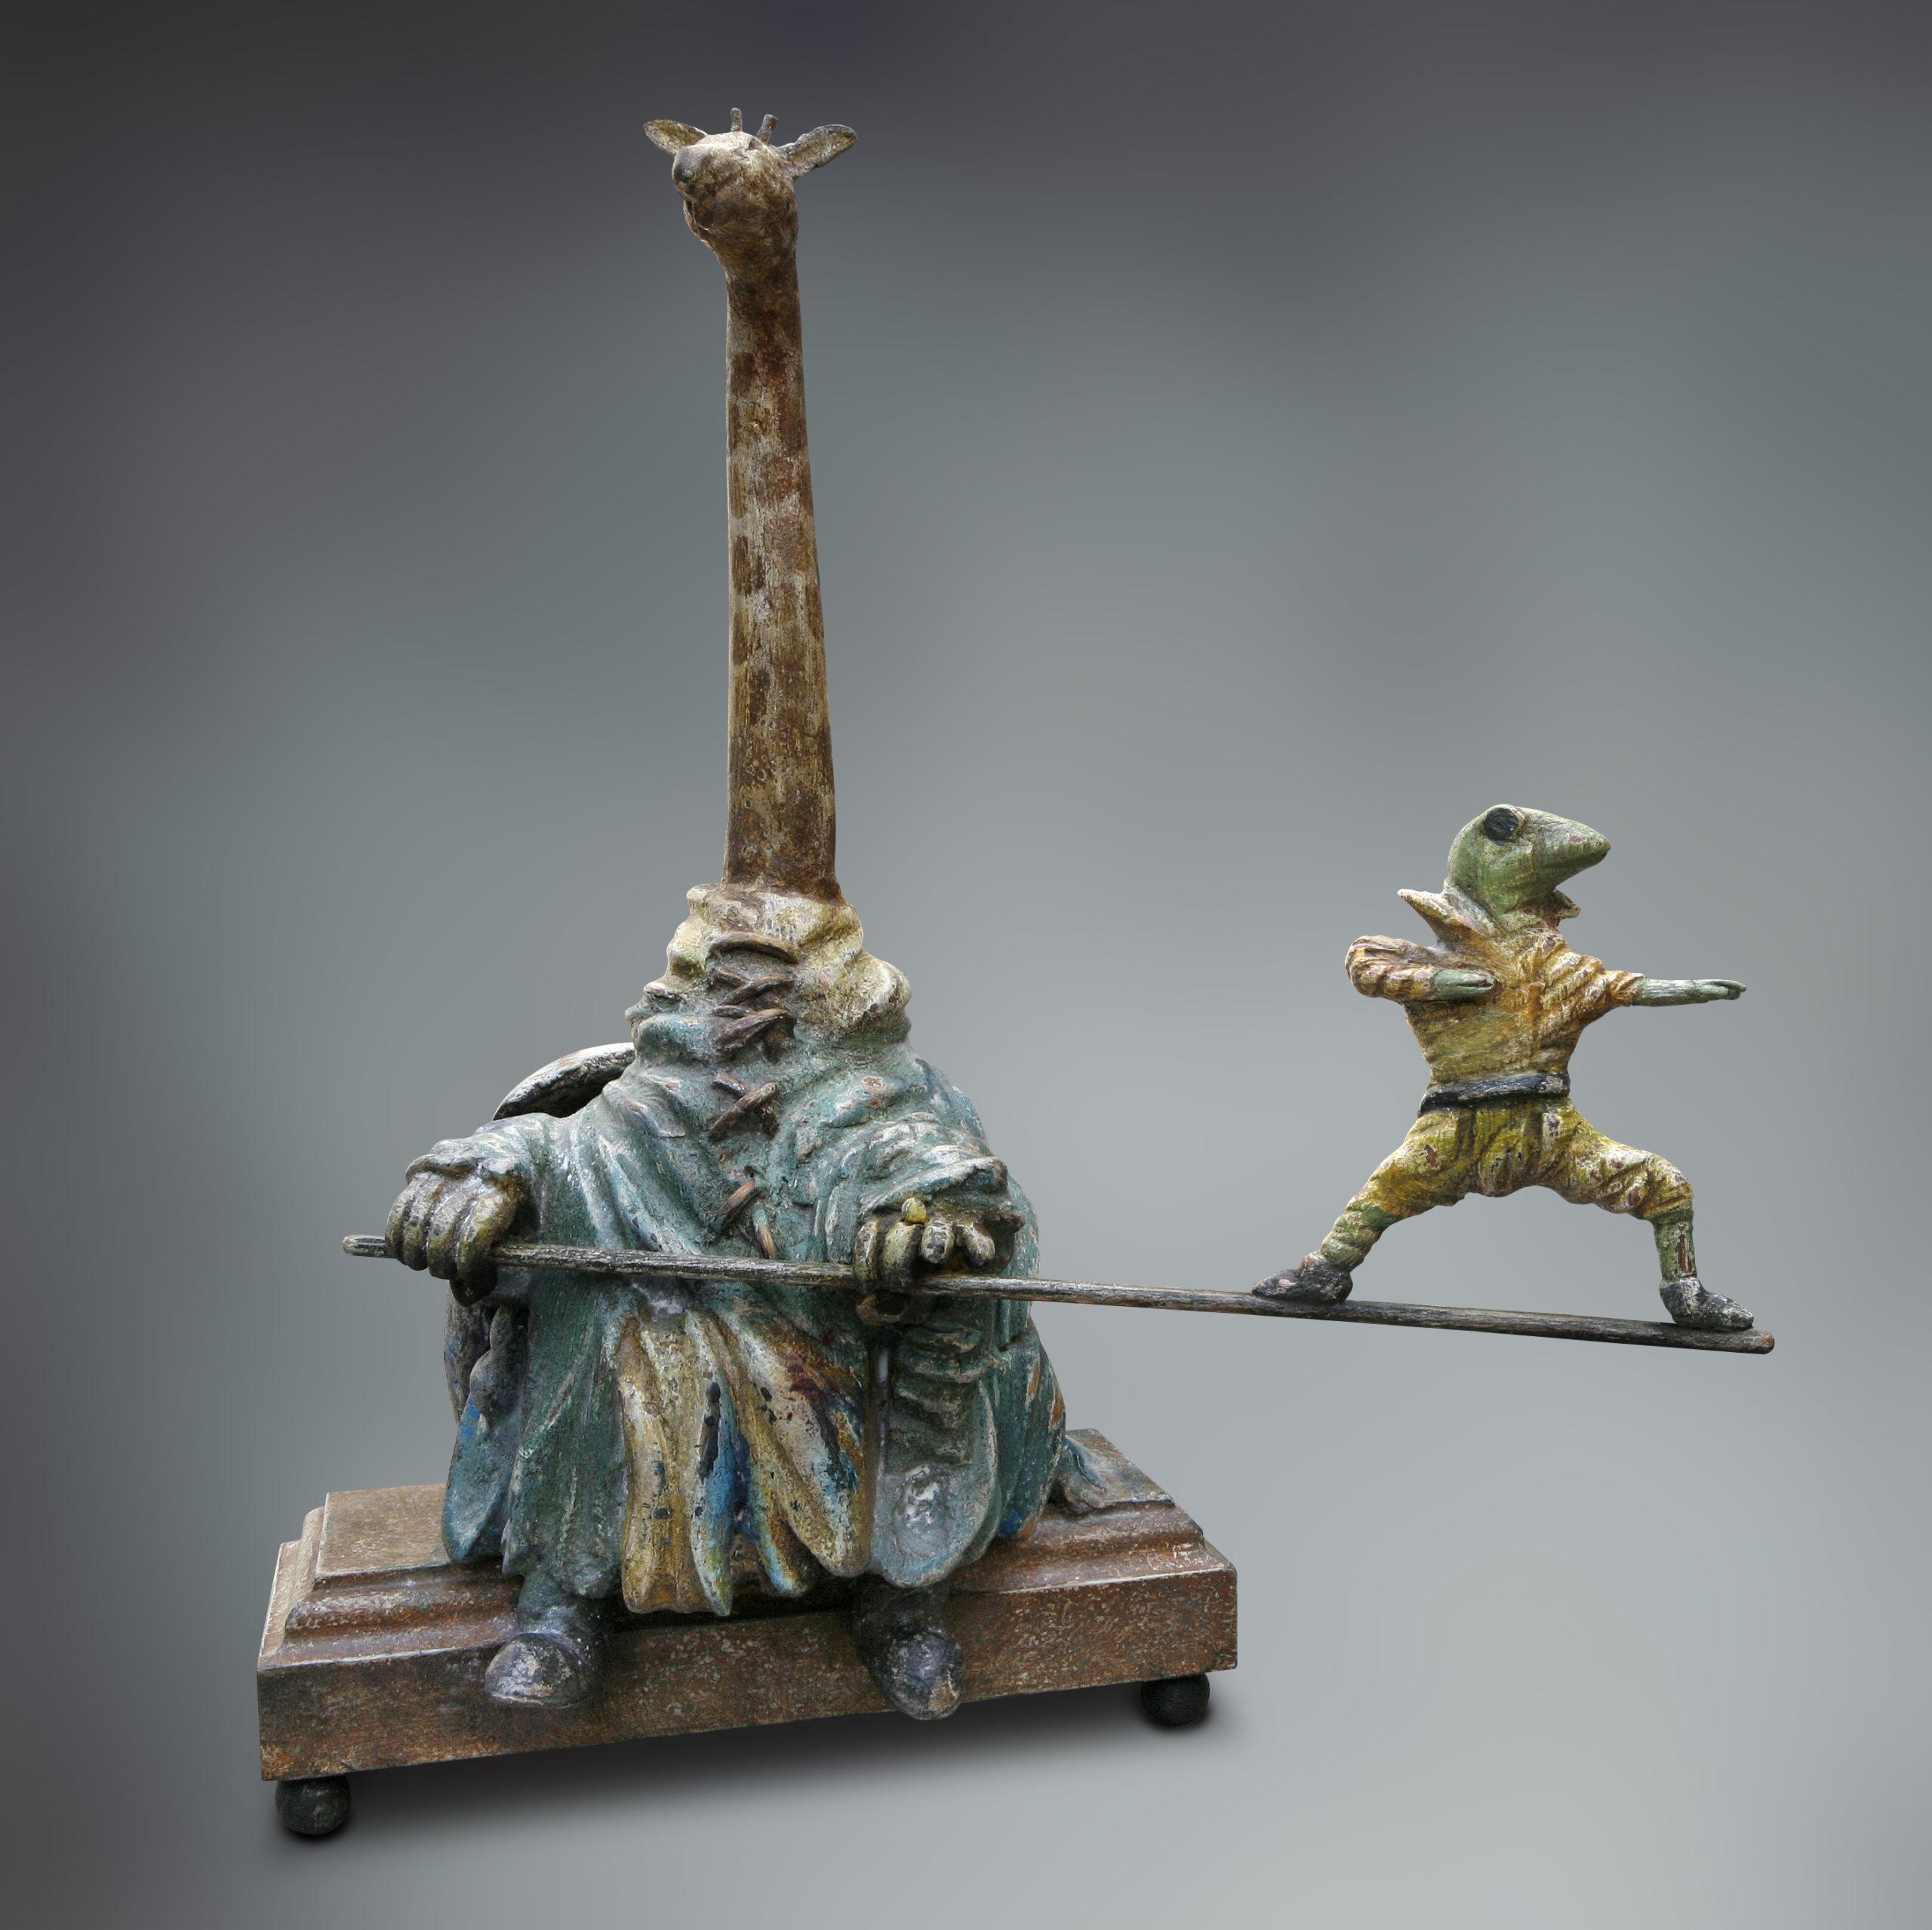 Giraffe met balancerende kikker - beeld in hout - Eugene Peters